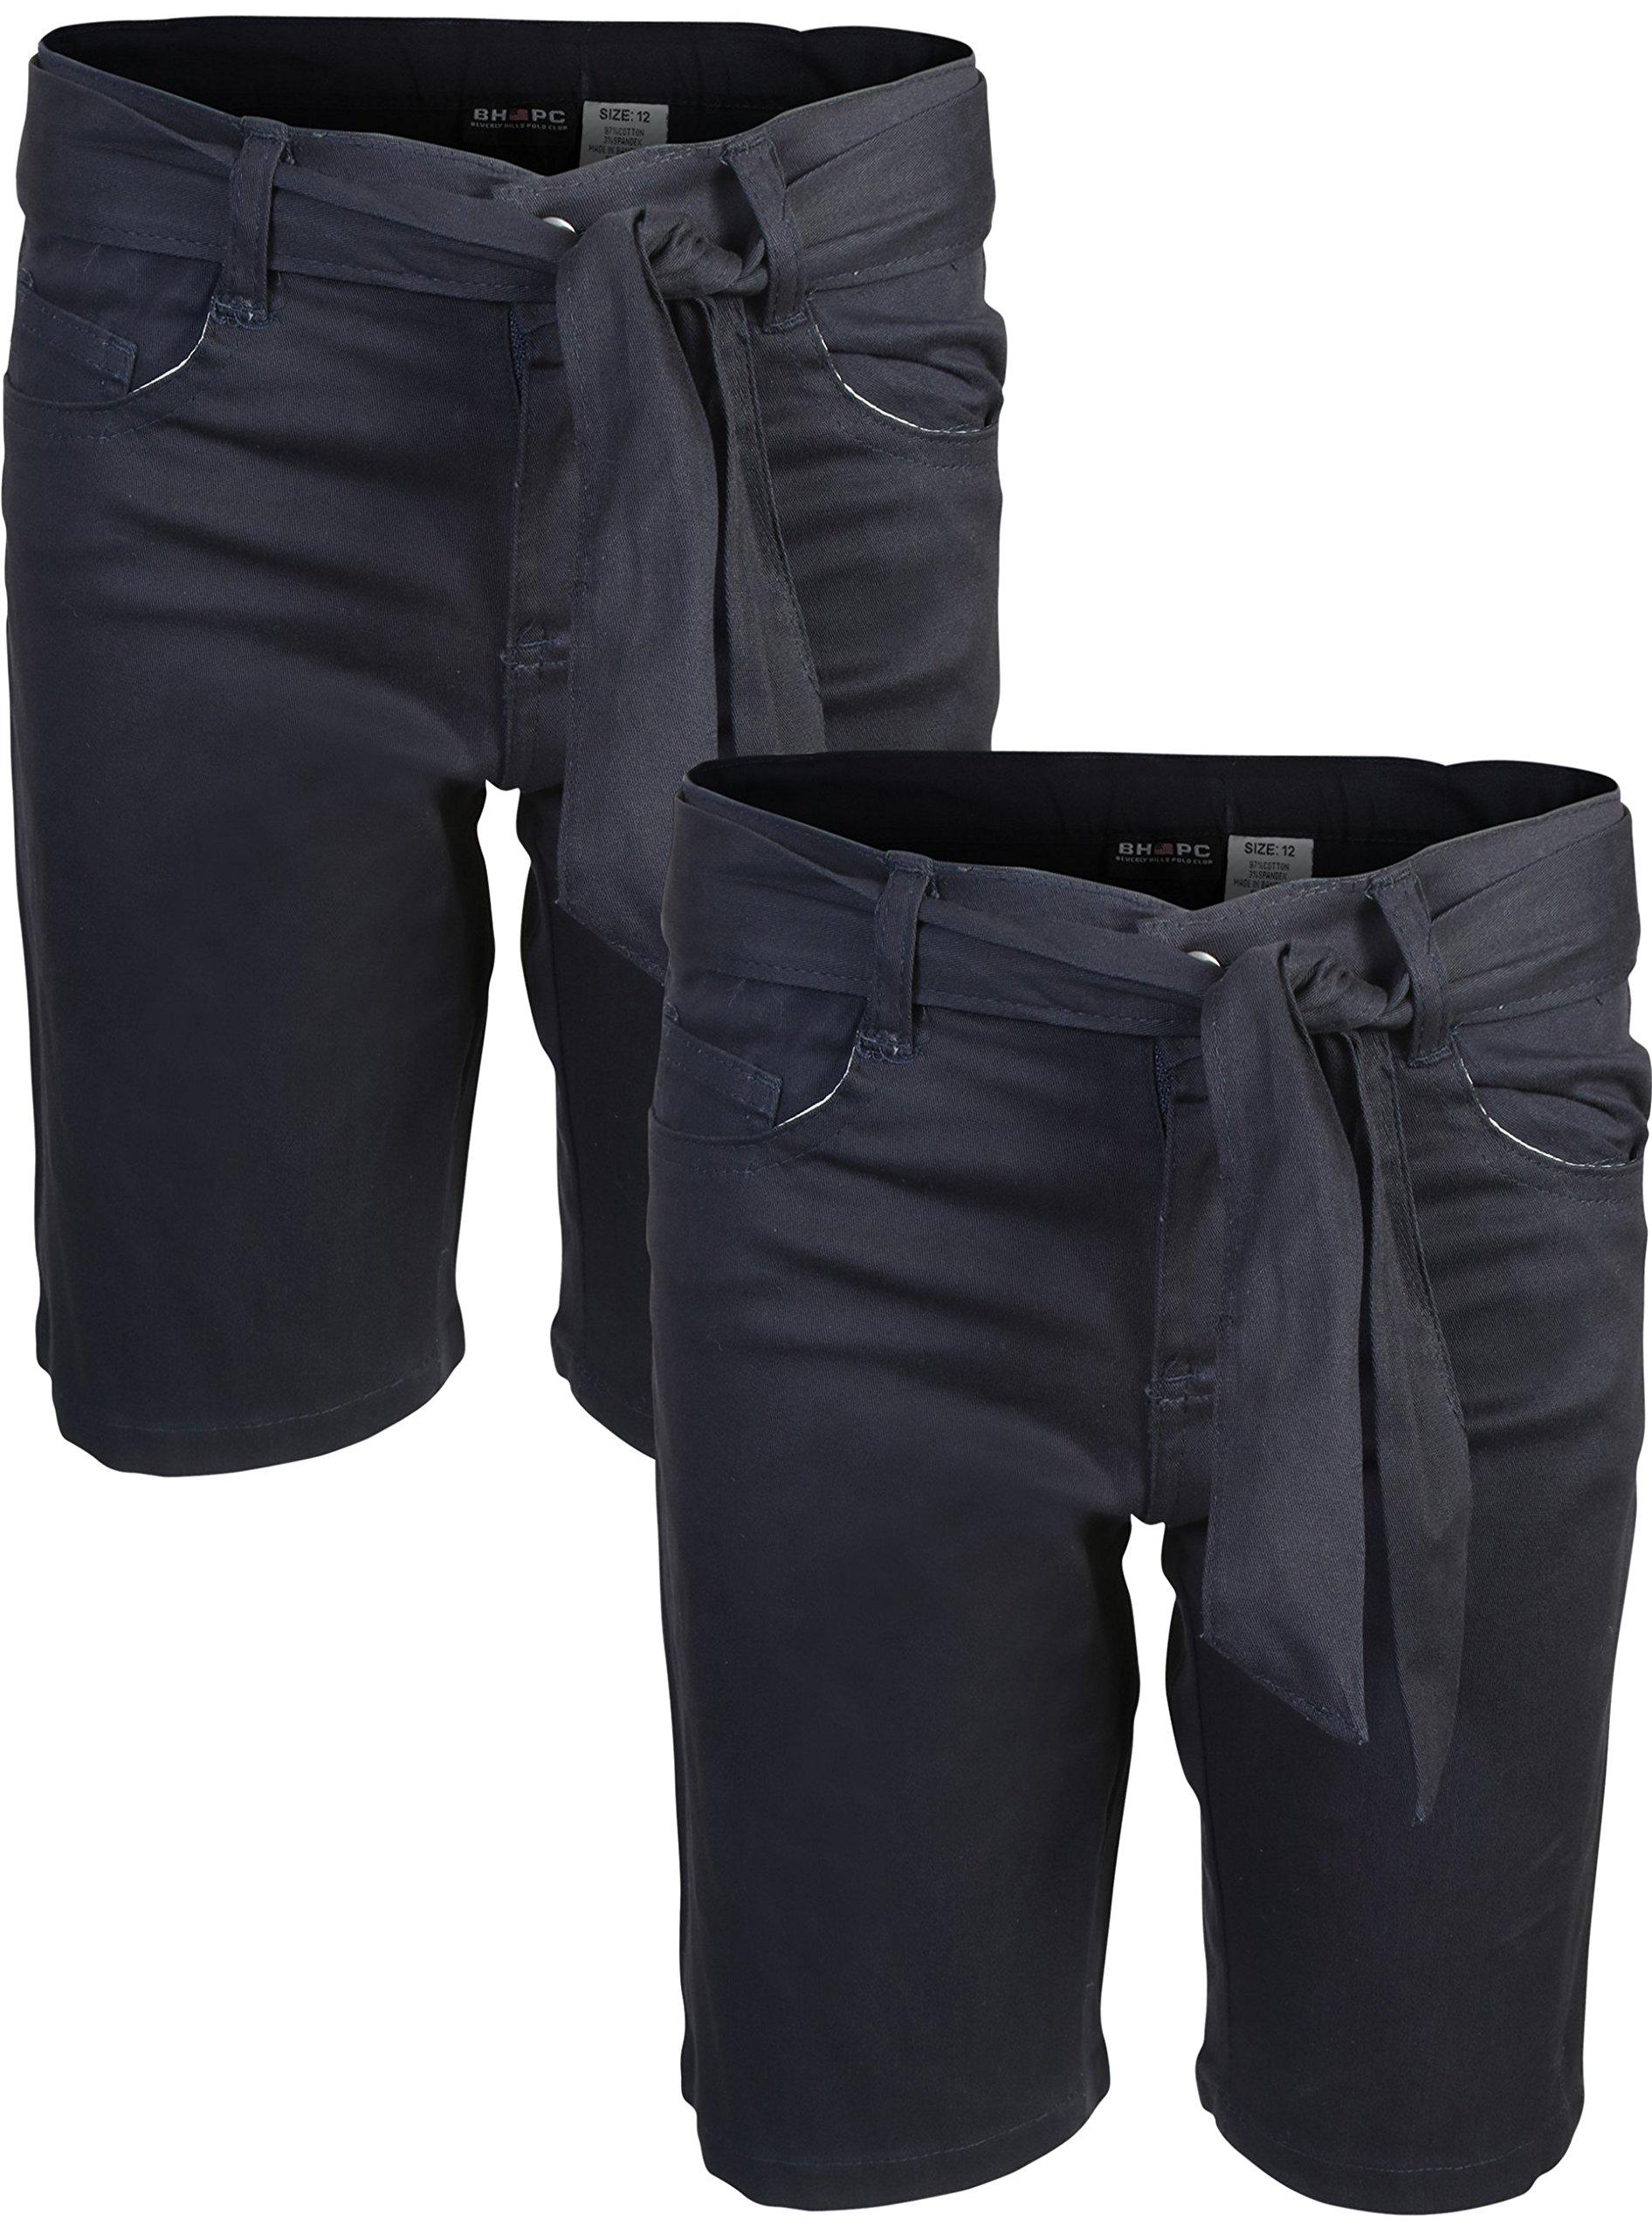 Beverly Hills Polo Club Girls School Uniform Belted Bermuda Shorts, Navy, Size 14'